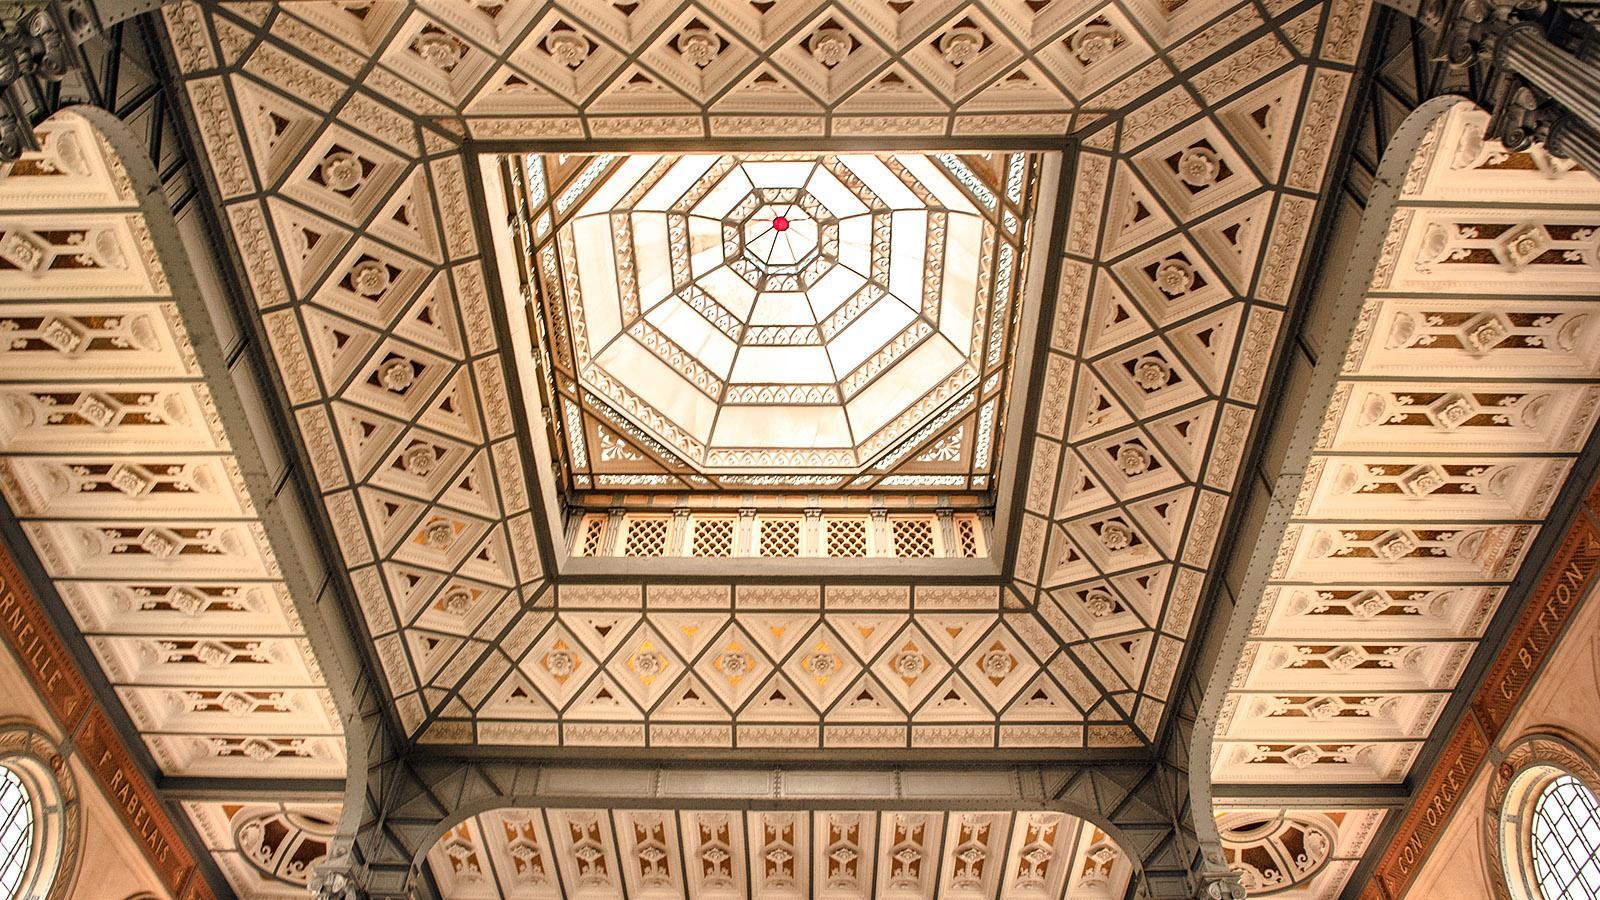 Fort-de-France: Die Decke des Lesesaals der BibliothèqueSchœlcher. Foto: Hilke Maunder